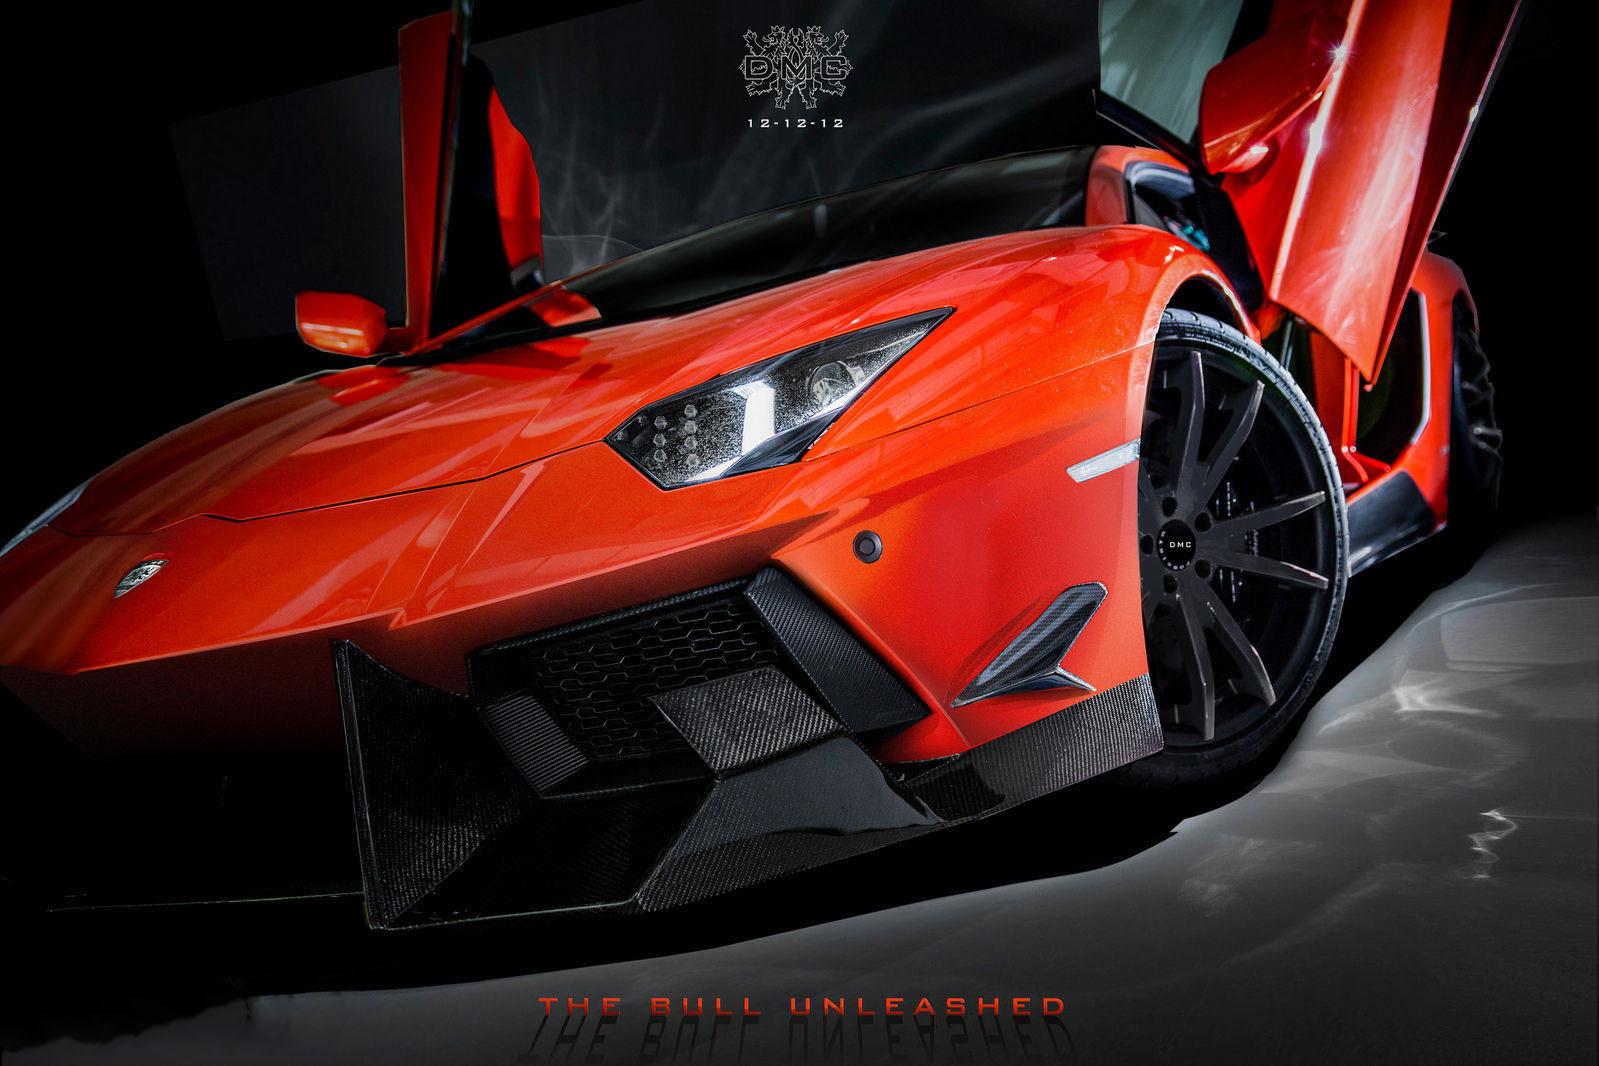 auto Lamborghini Aventador LP900 SV Limited Edition by DMC Tuning